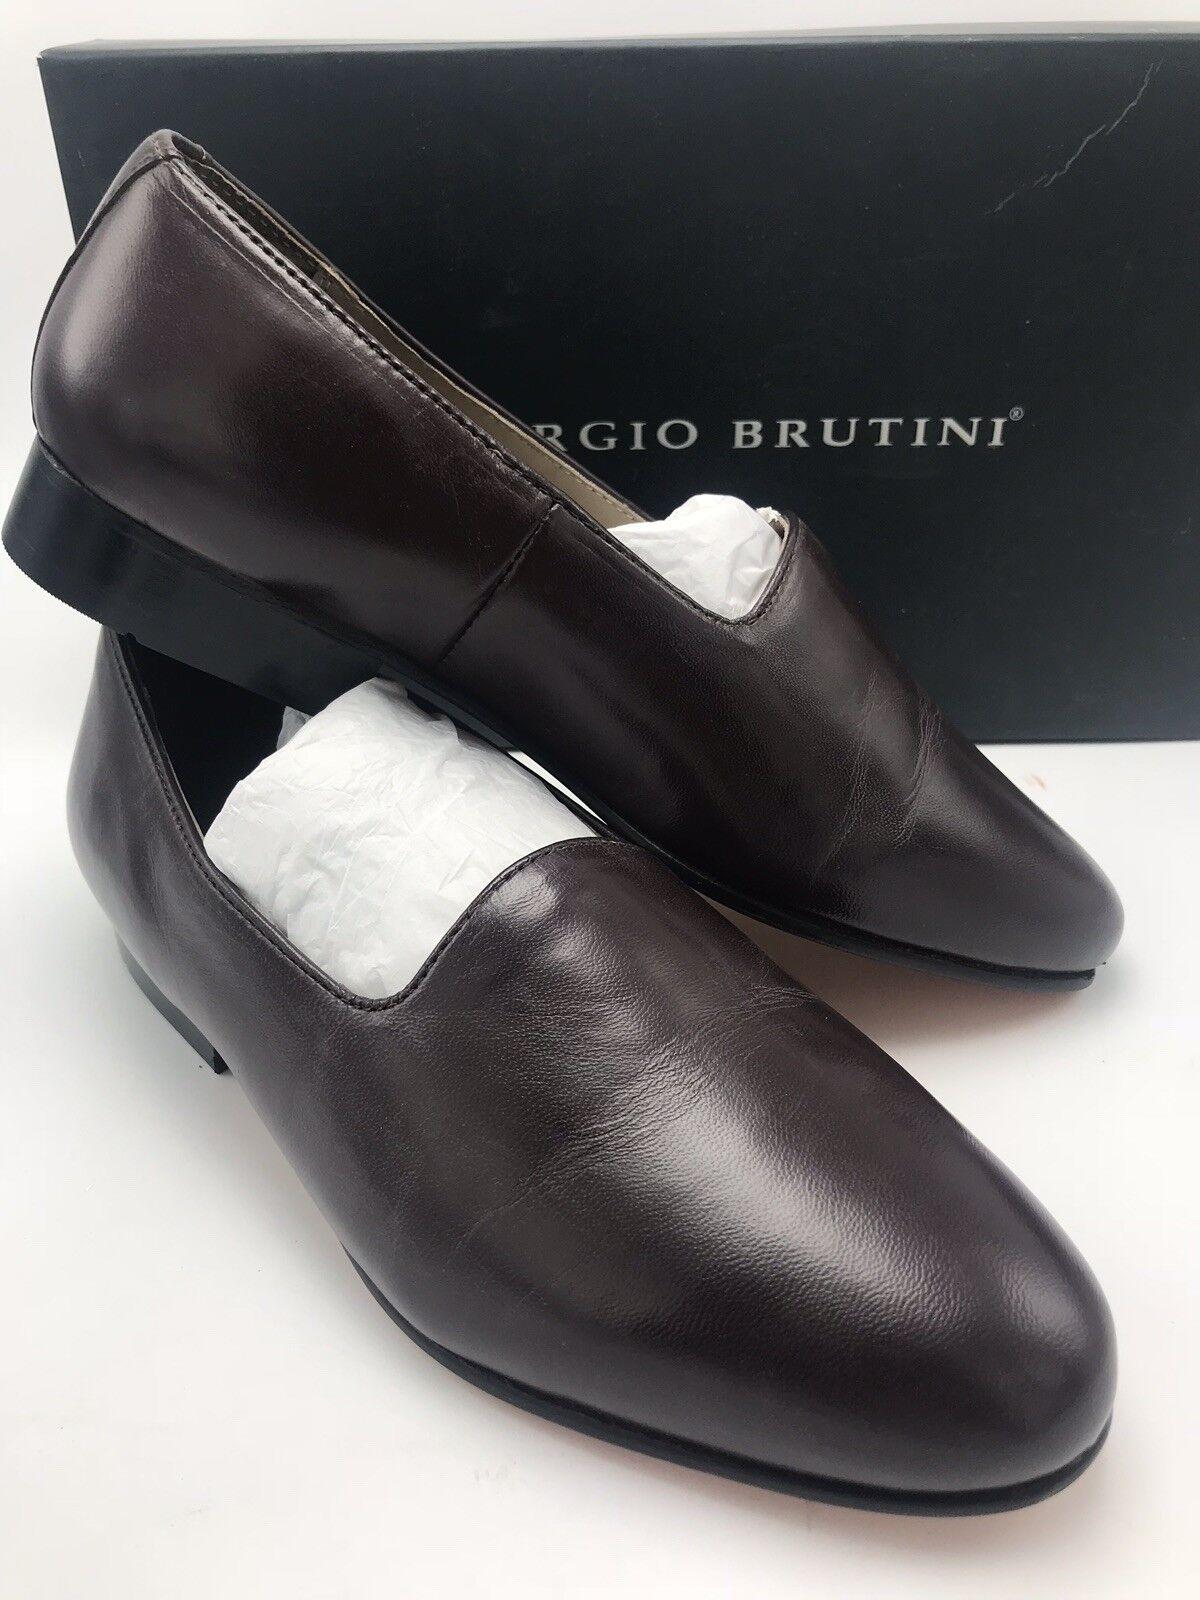 Giorgio Brutini Men's Slip On Loafer Crawley 244377 Wine Size 8.5 M